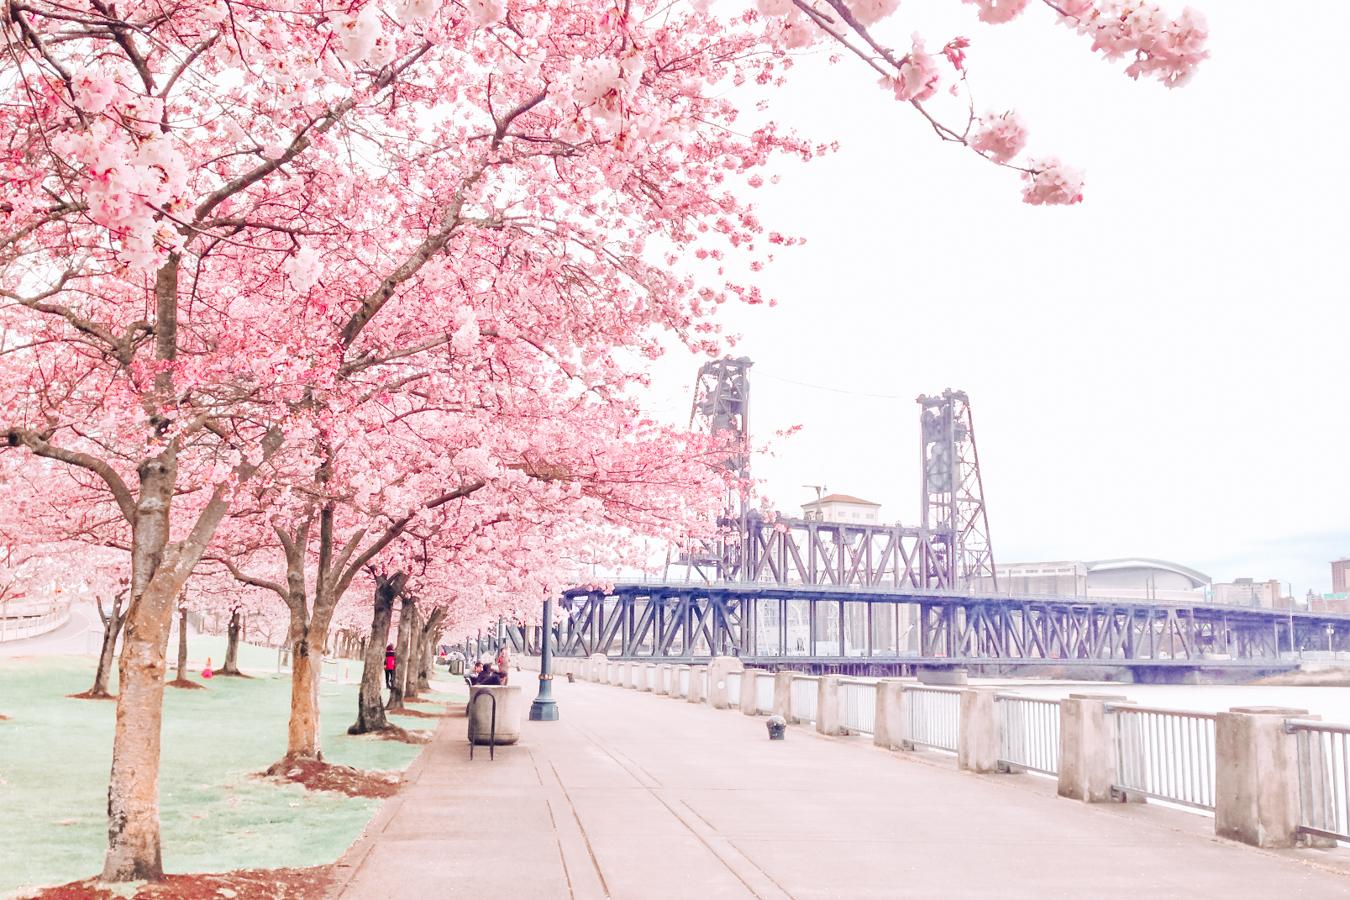 Waterfront park in Portland